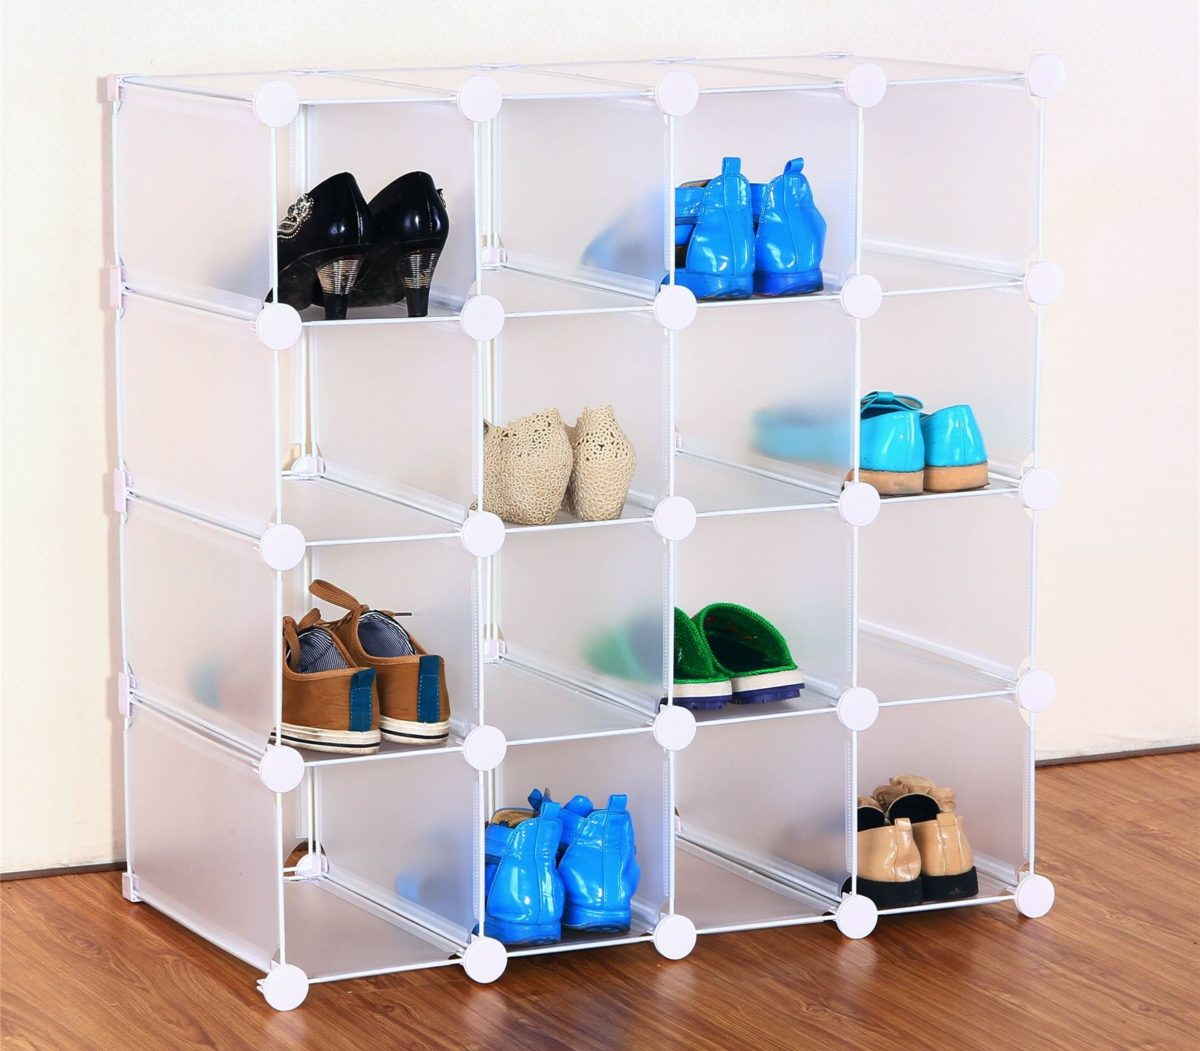 Фото полки для обуви из пластика